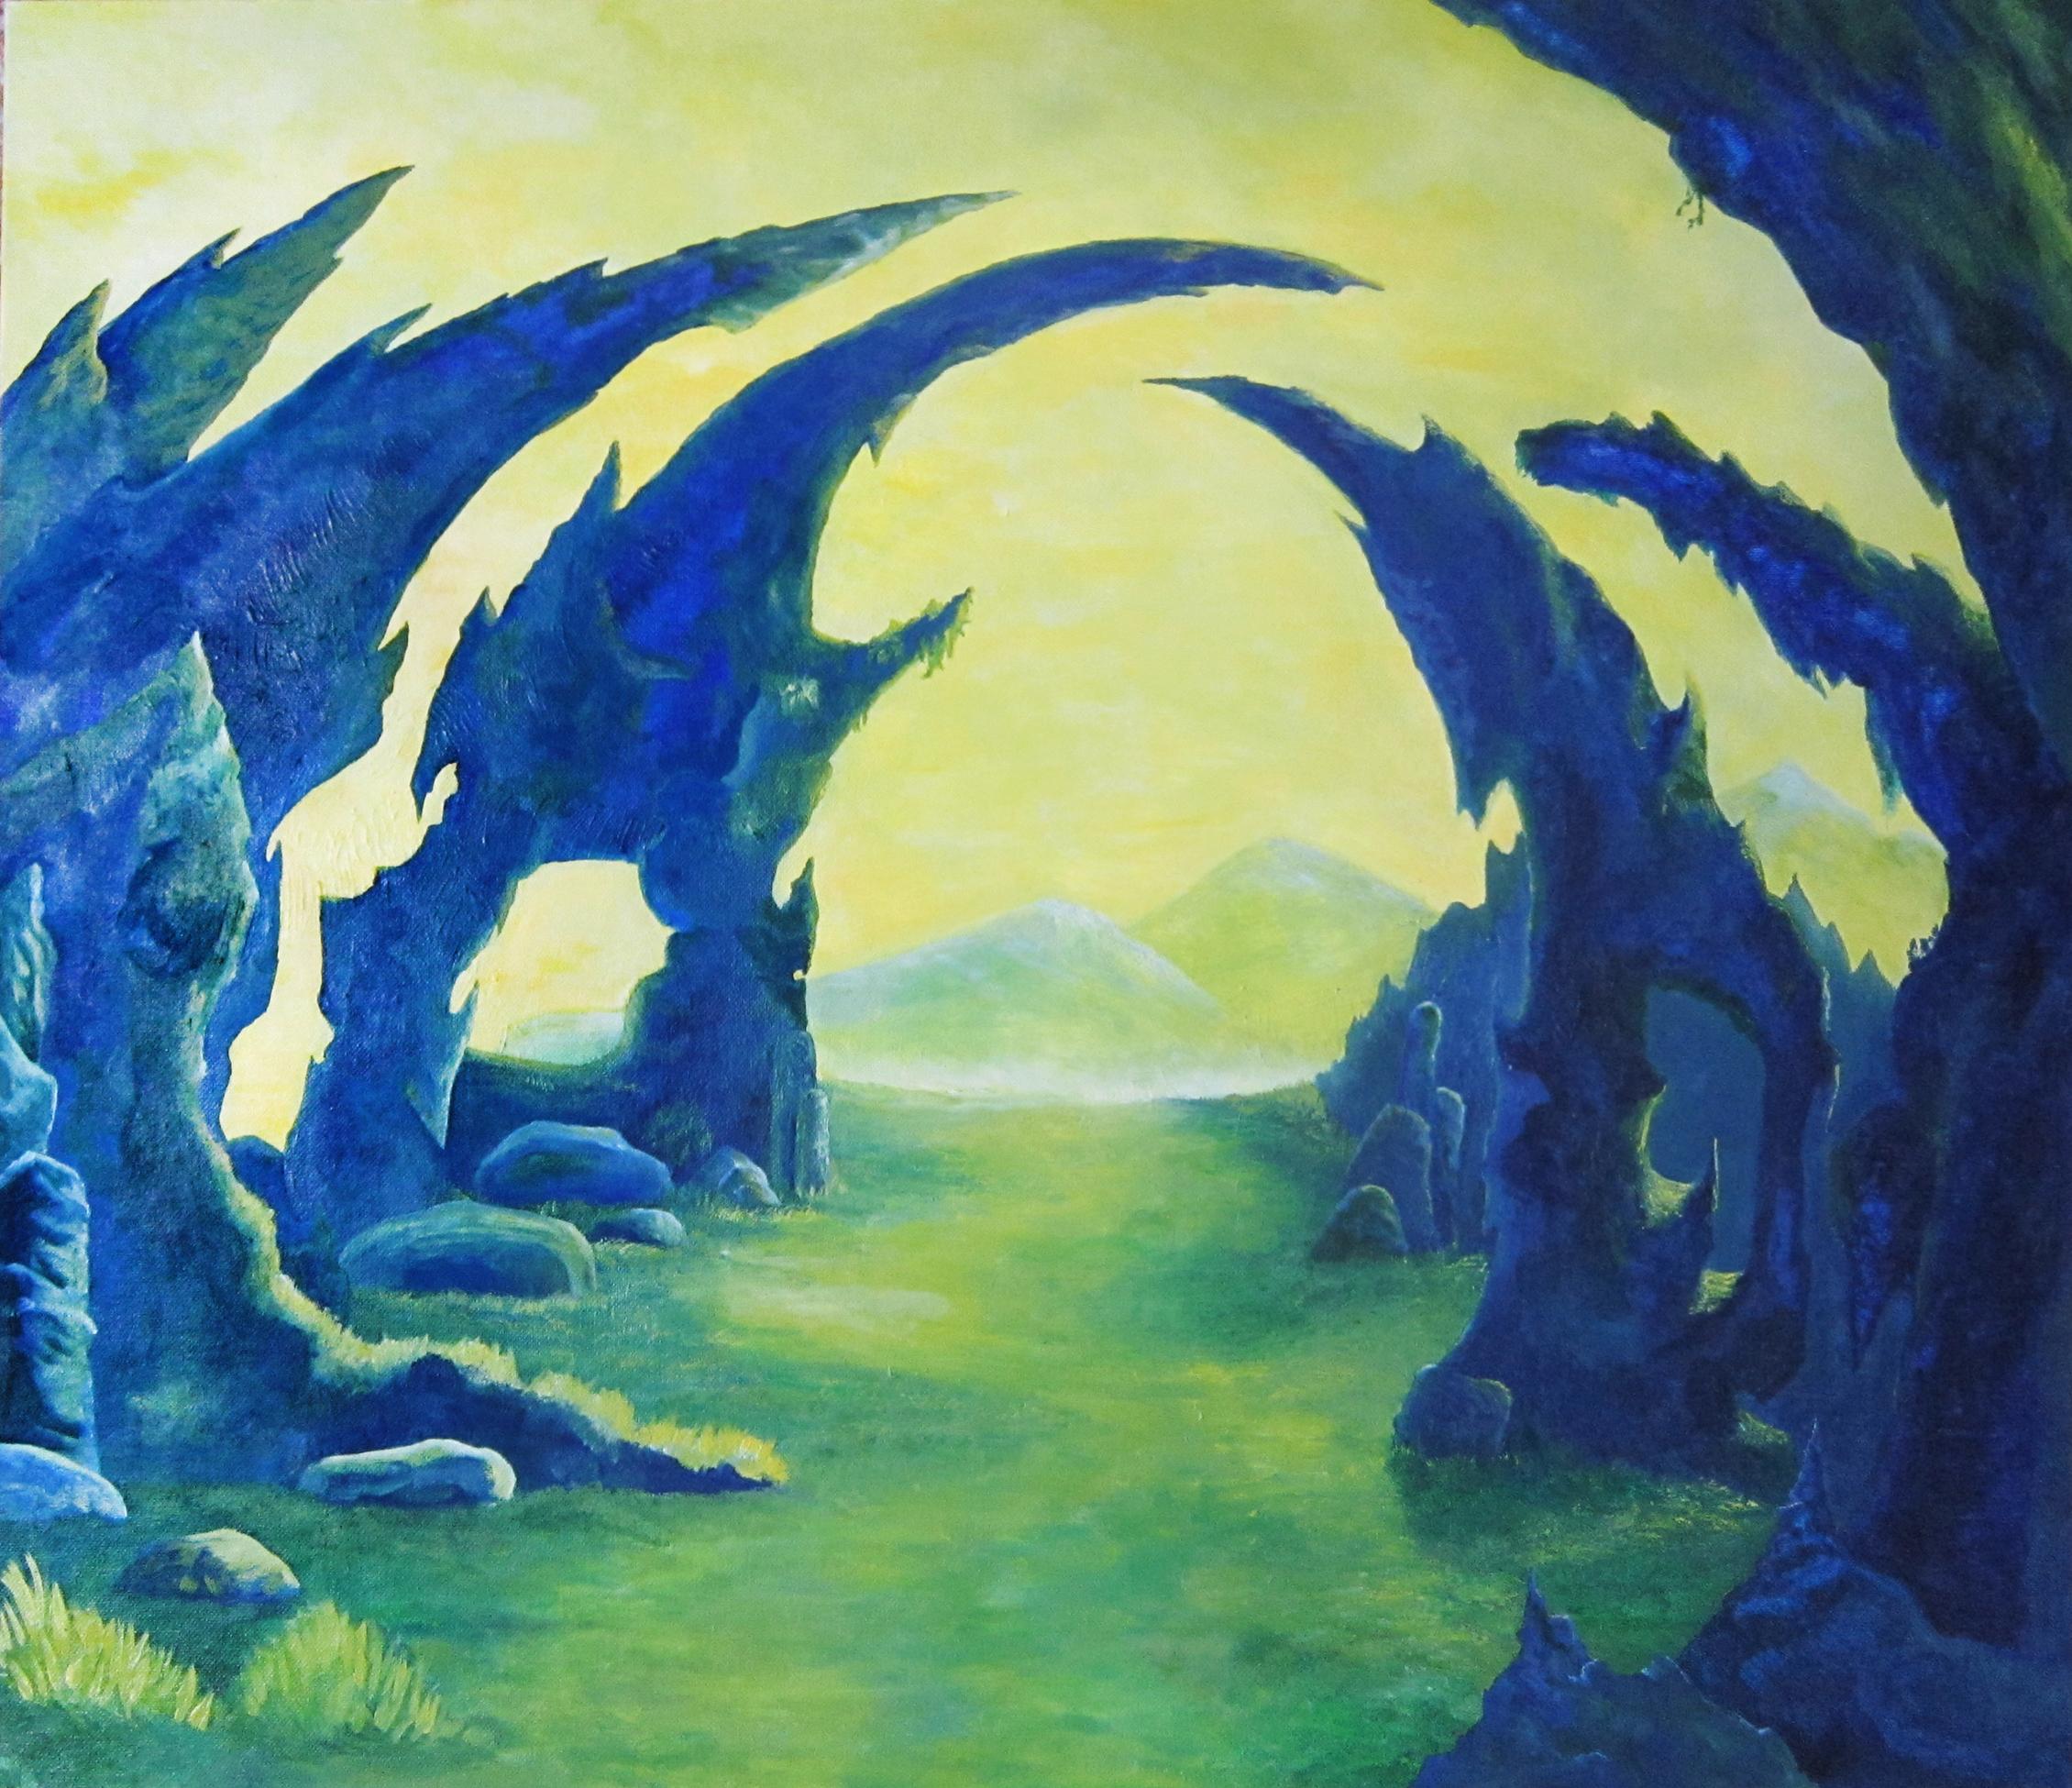 Wasteland, olieverf, 70 x 60, 2000